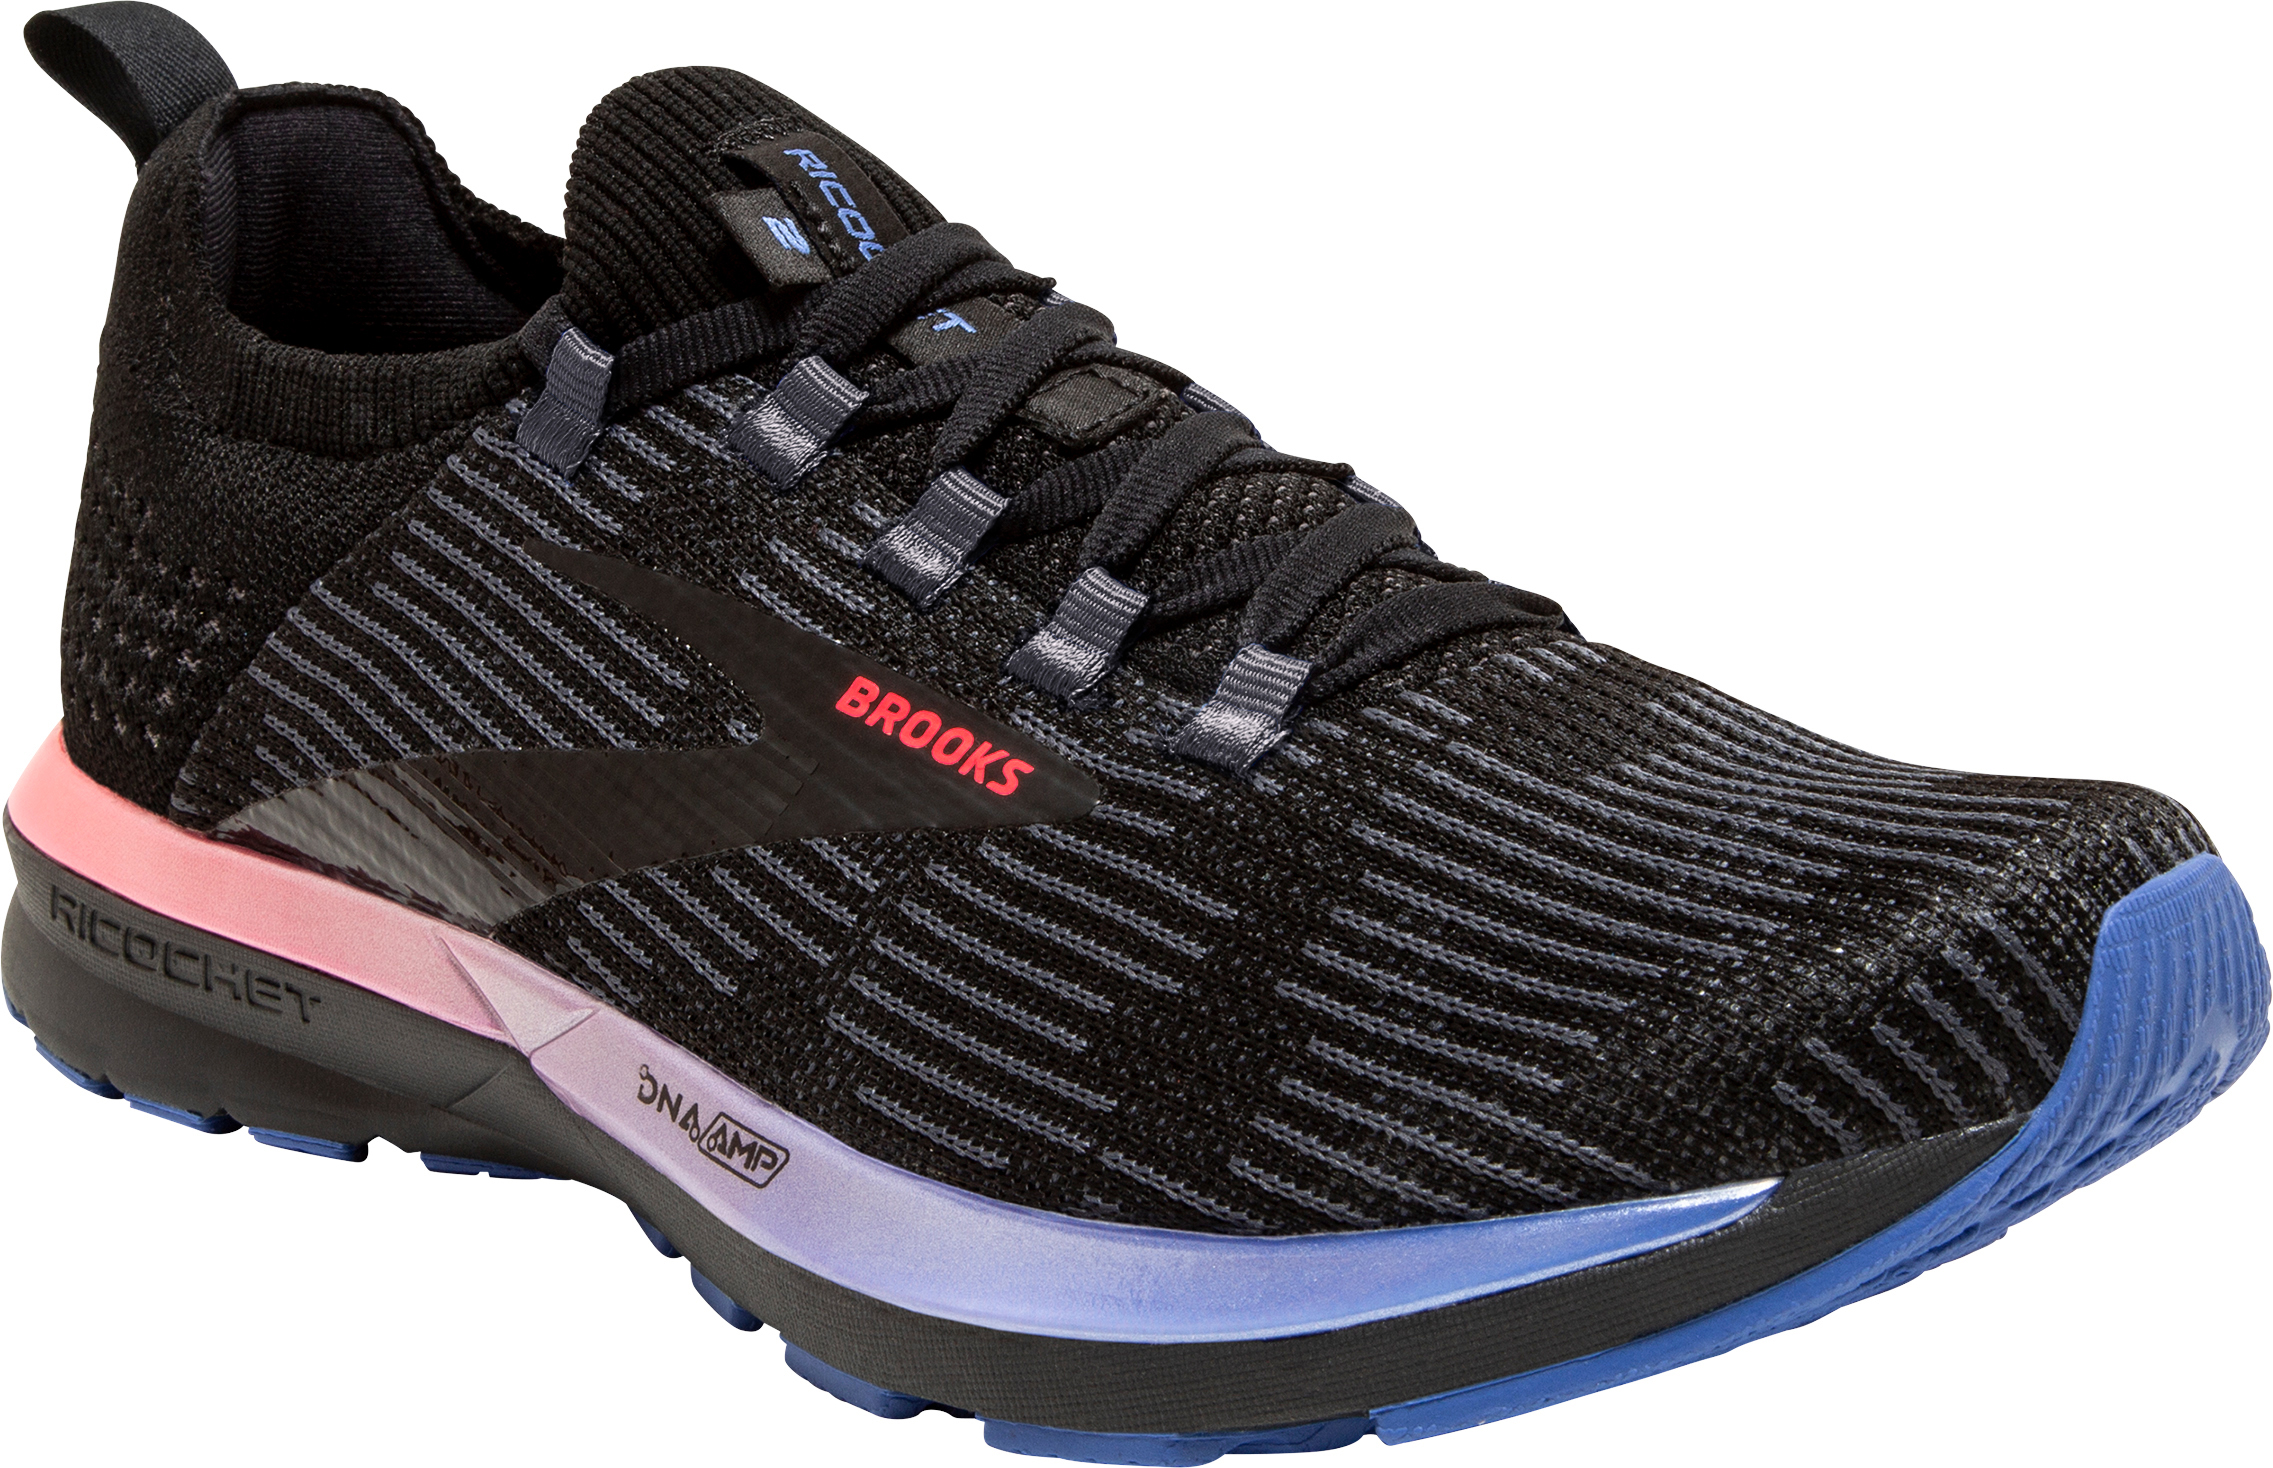 Brooks Ricochet 2 Road Running Shoes